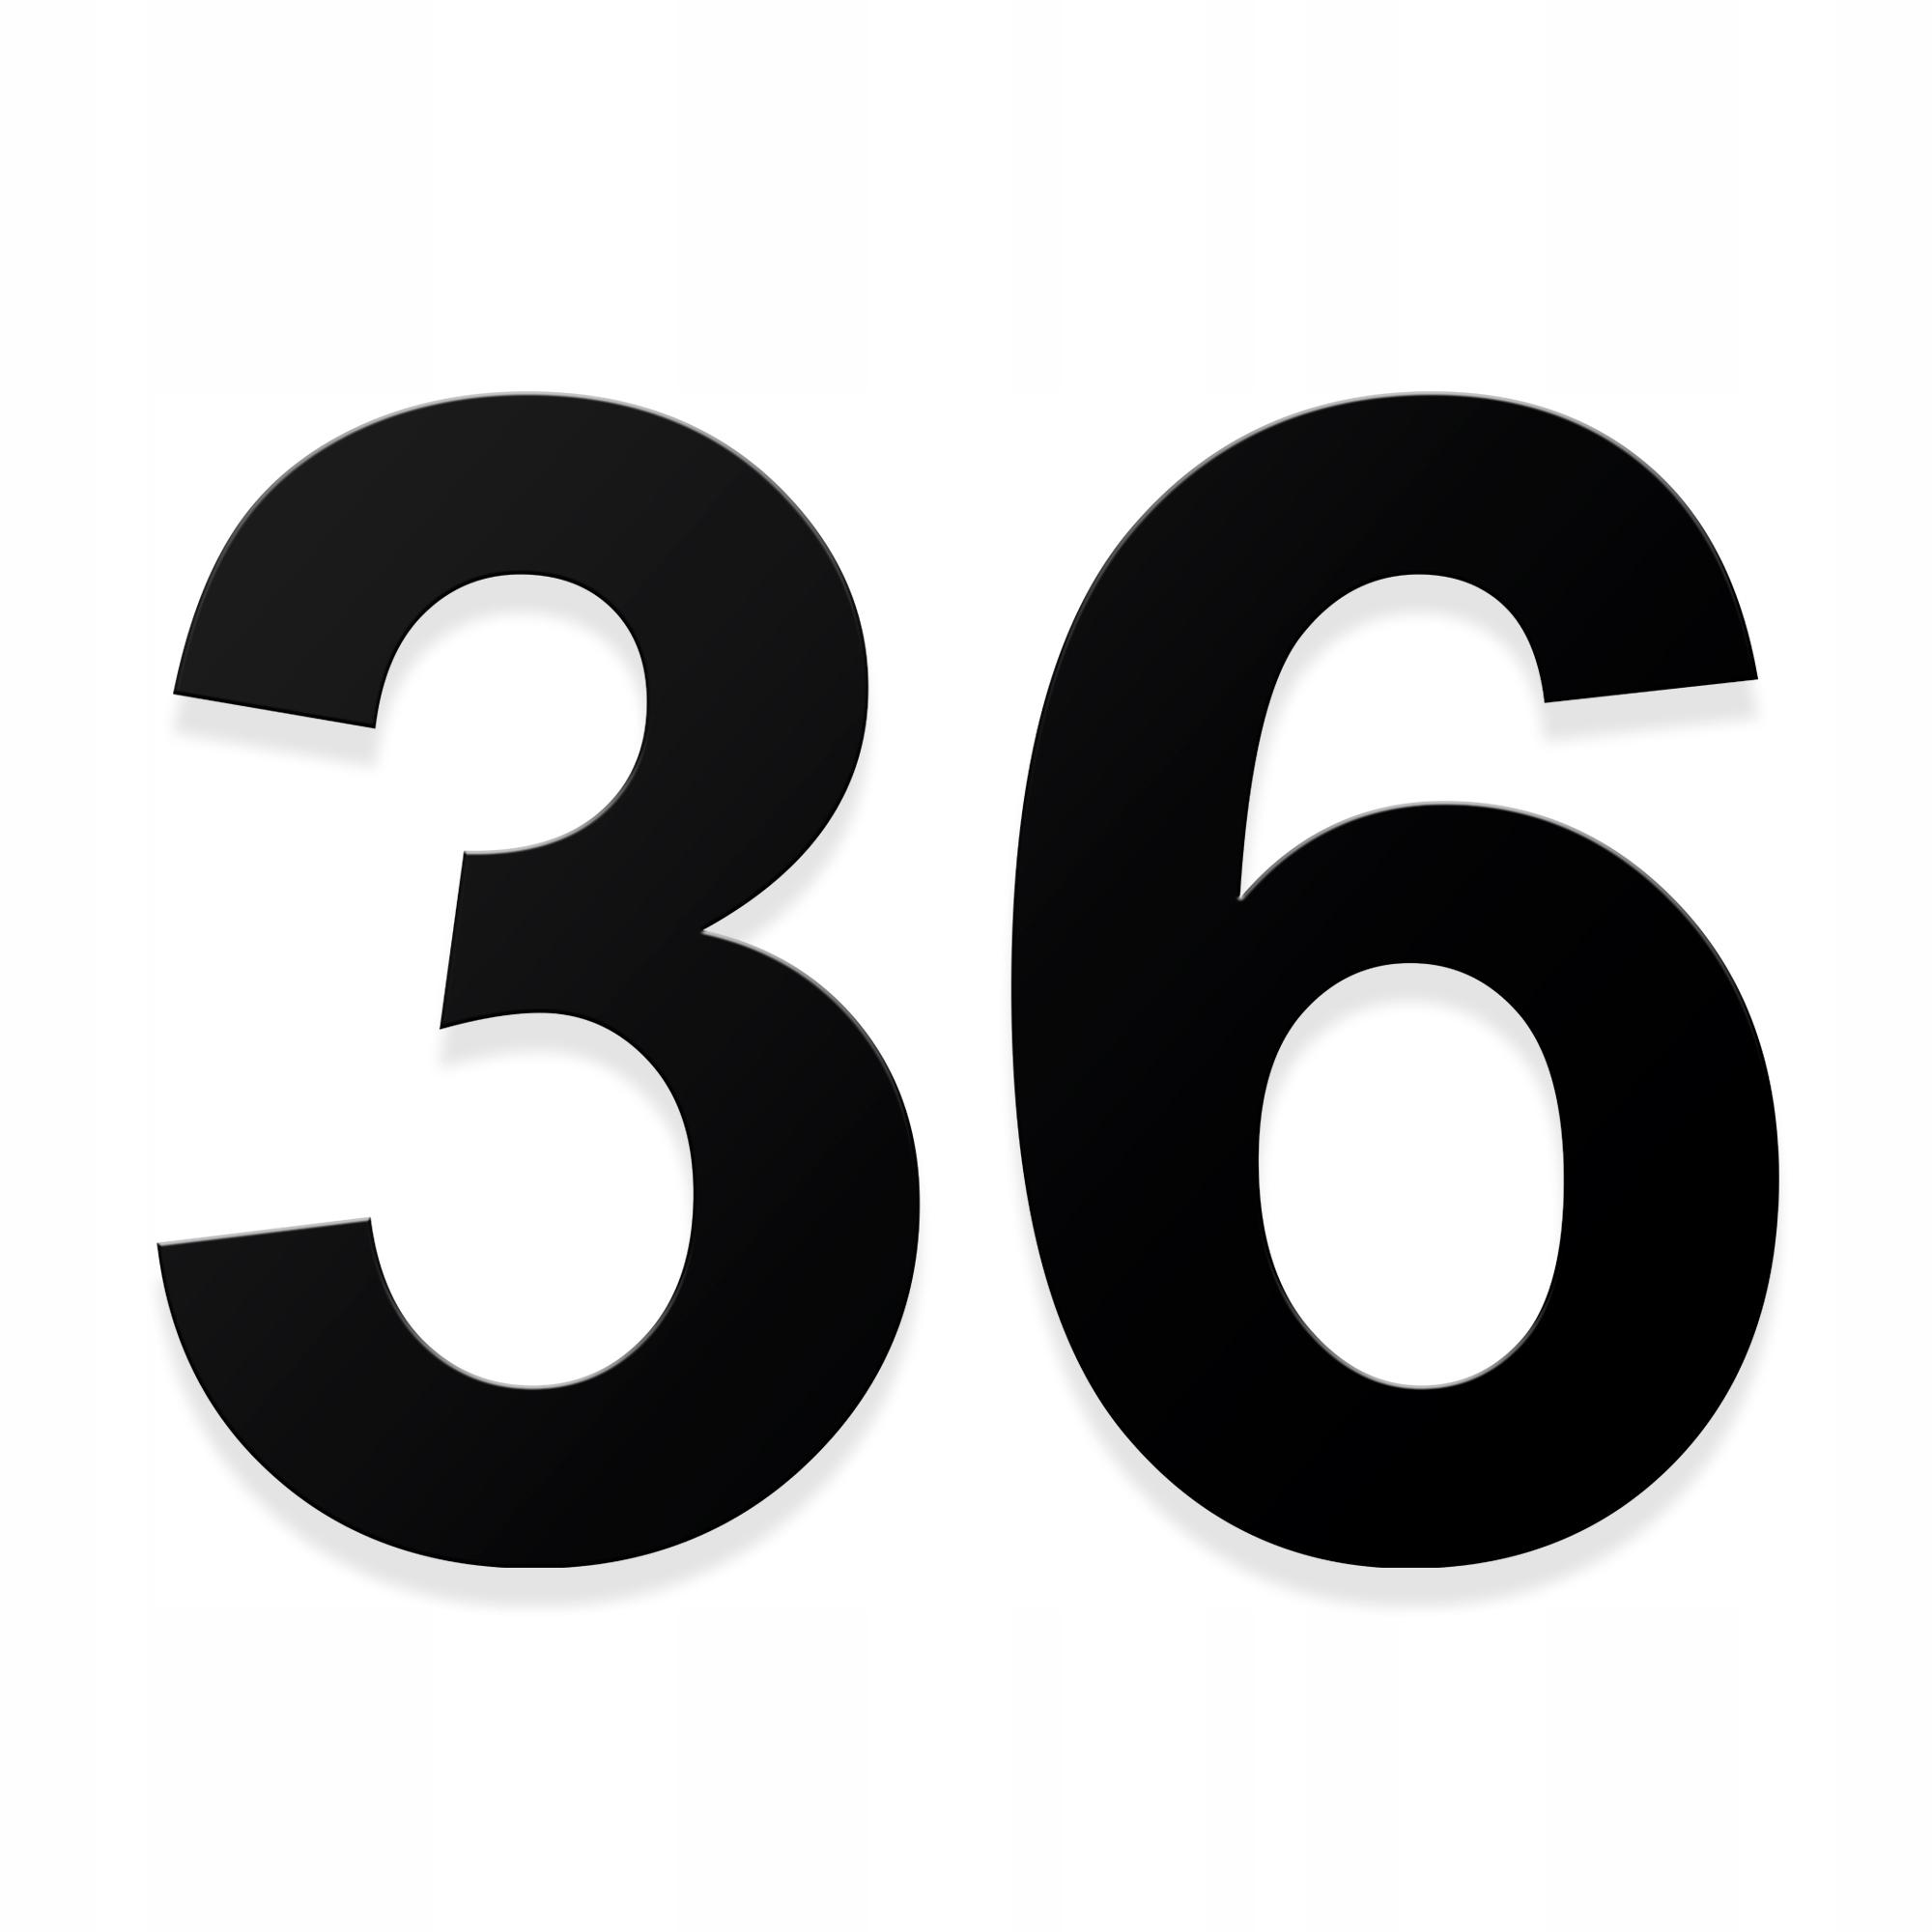 Numer na dom numeracja adres cyfra 3D 23cm kolory